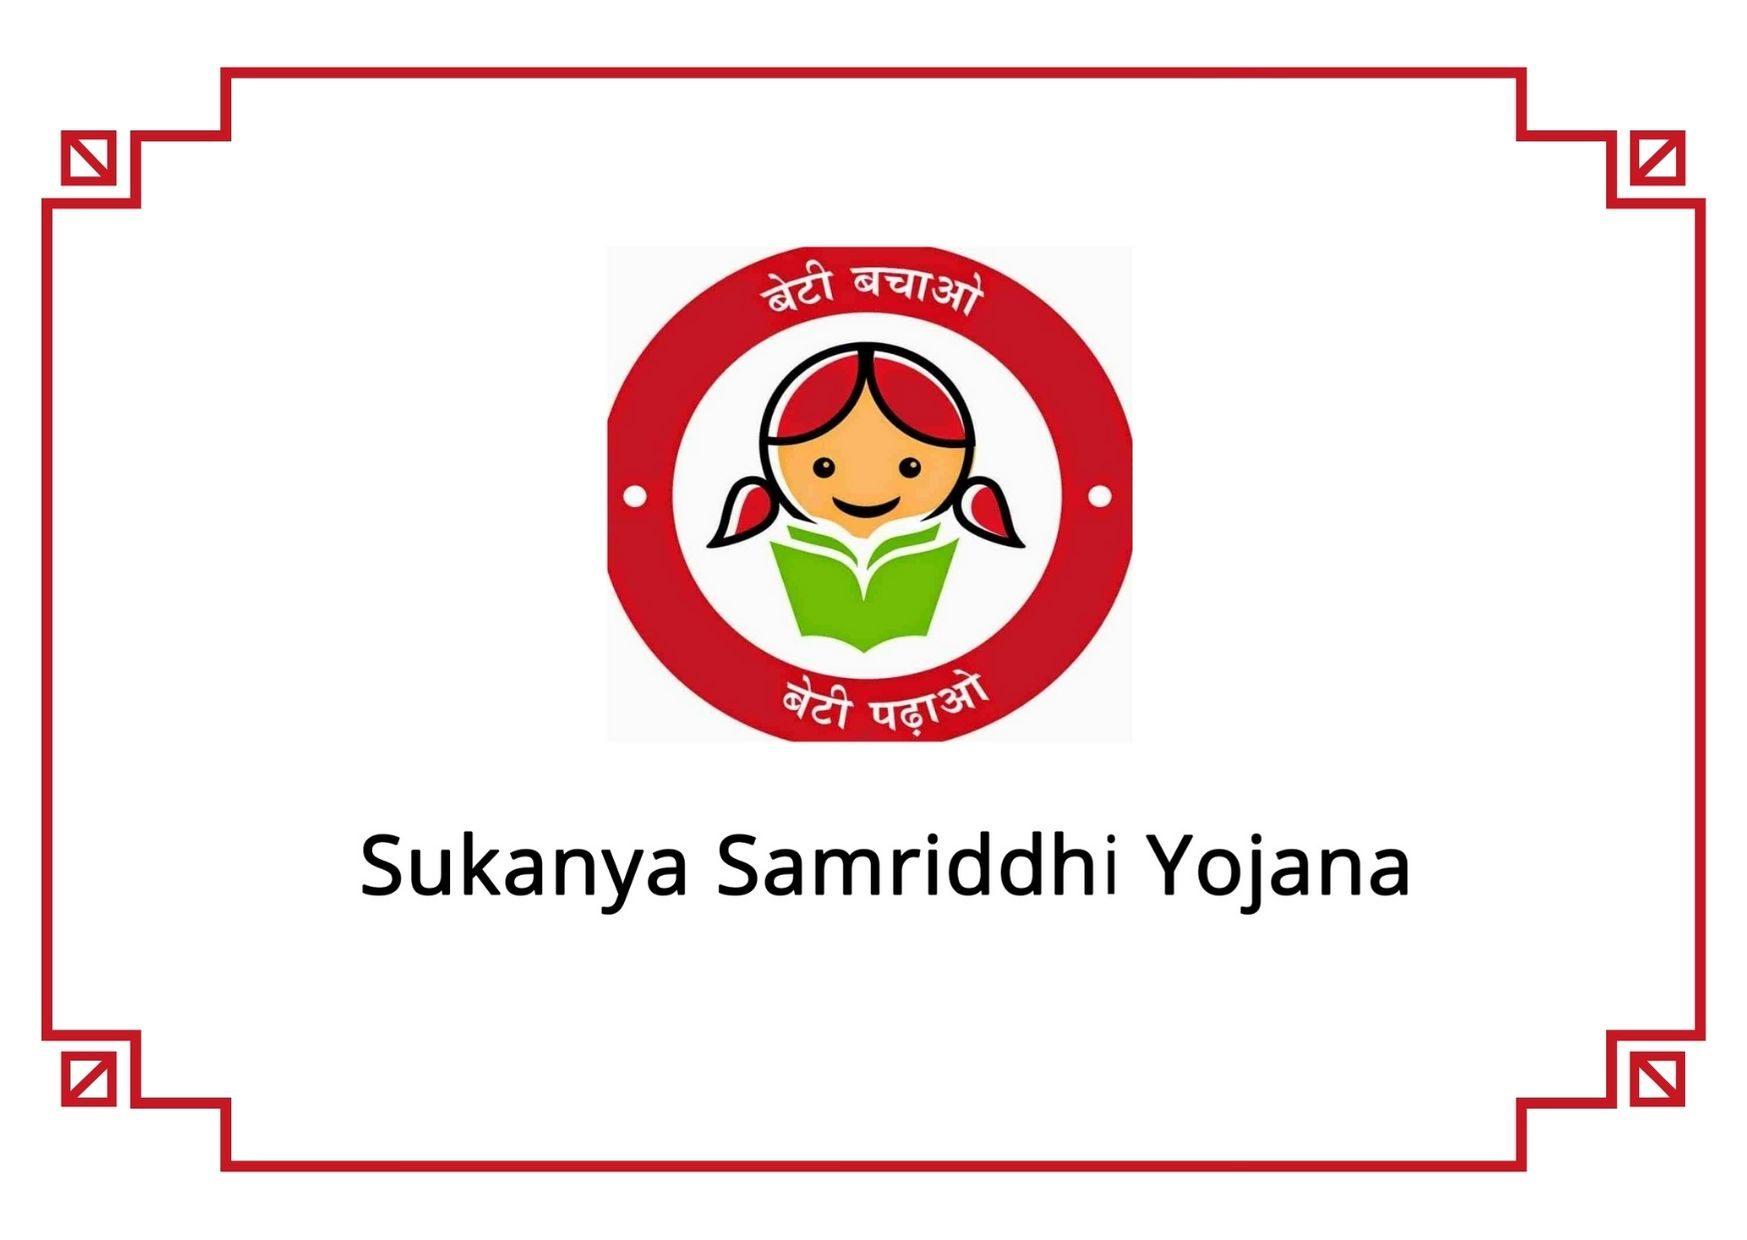 Sukanya Samriddhi Yojana Scheme, Eligibility Criteria and Advantages